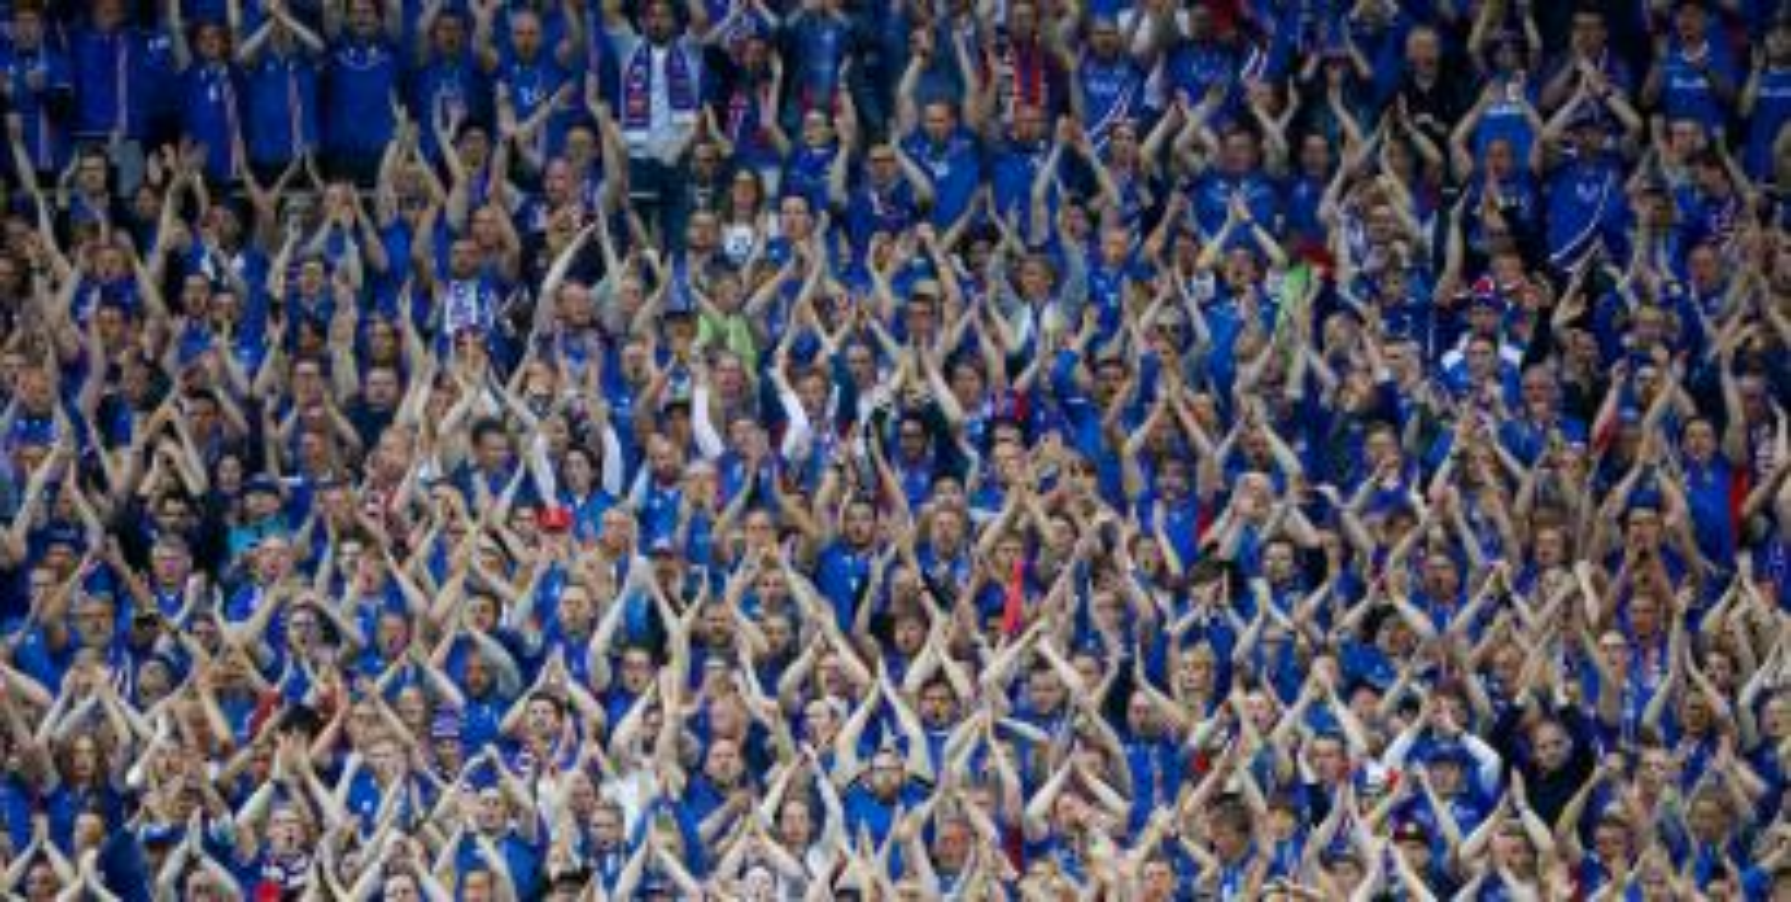 Football Soccer - France v Iceland - EURO 2016 - Quarter Final - Stade de France, Saint-Denis near Paris, France - 3/7/16 Iceland fans REUTERS/Christian Hartmann Livepic - RTX2JIVT